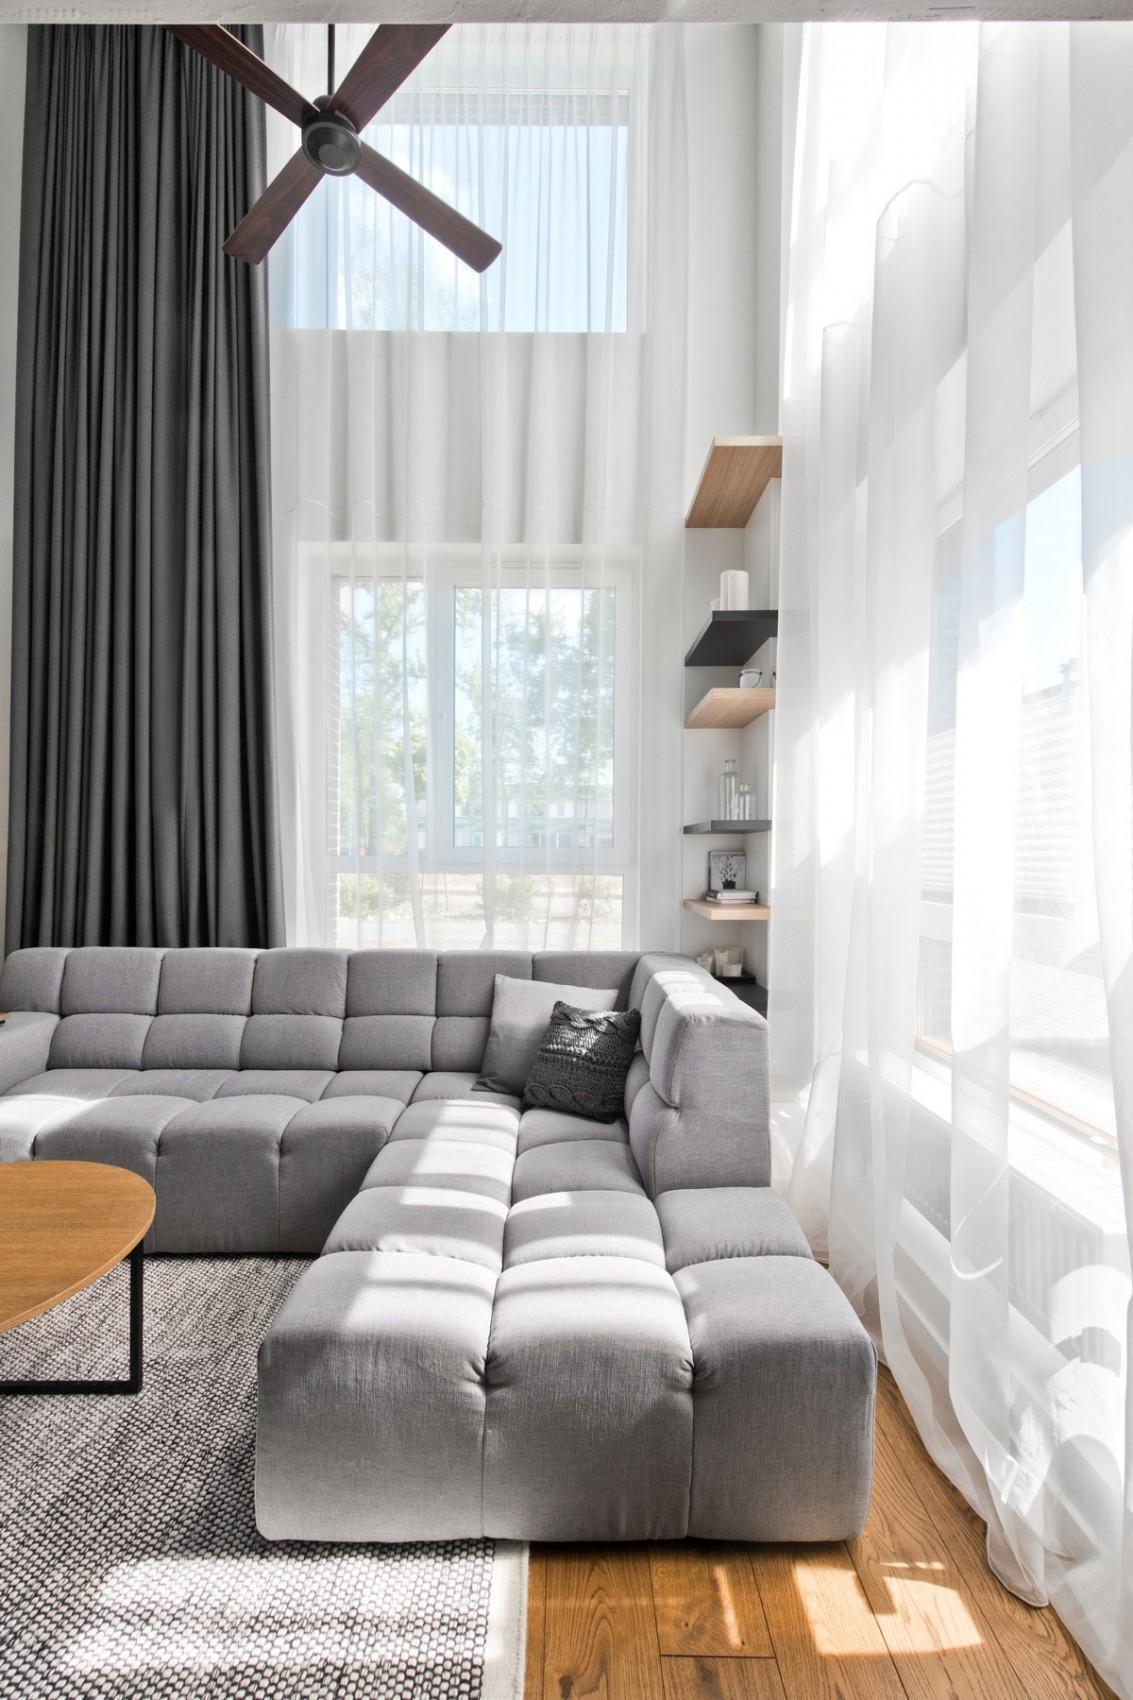 Houses Interior Nice